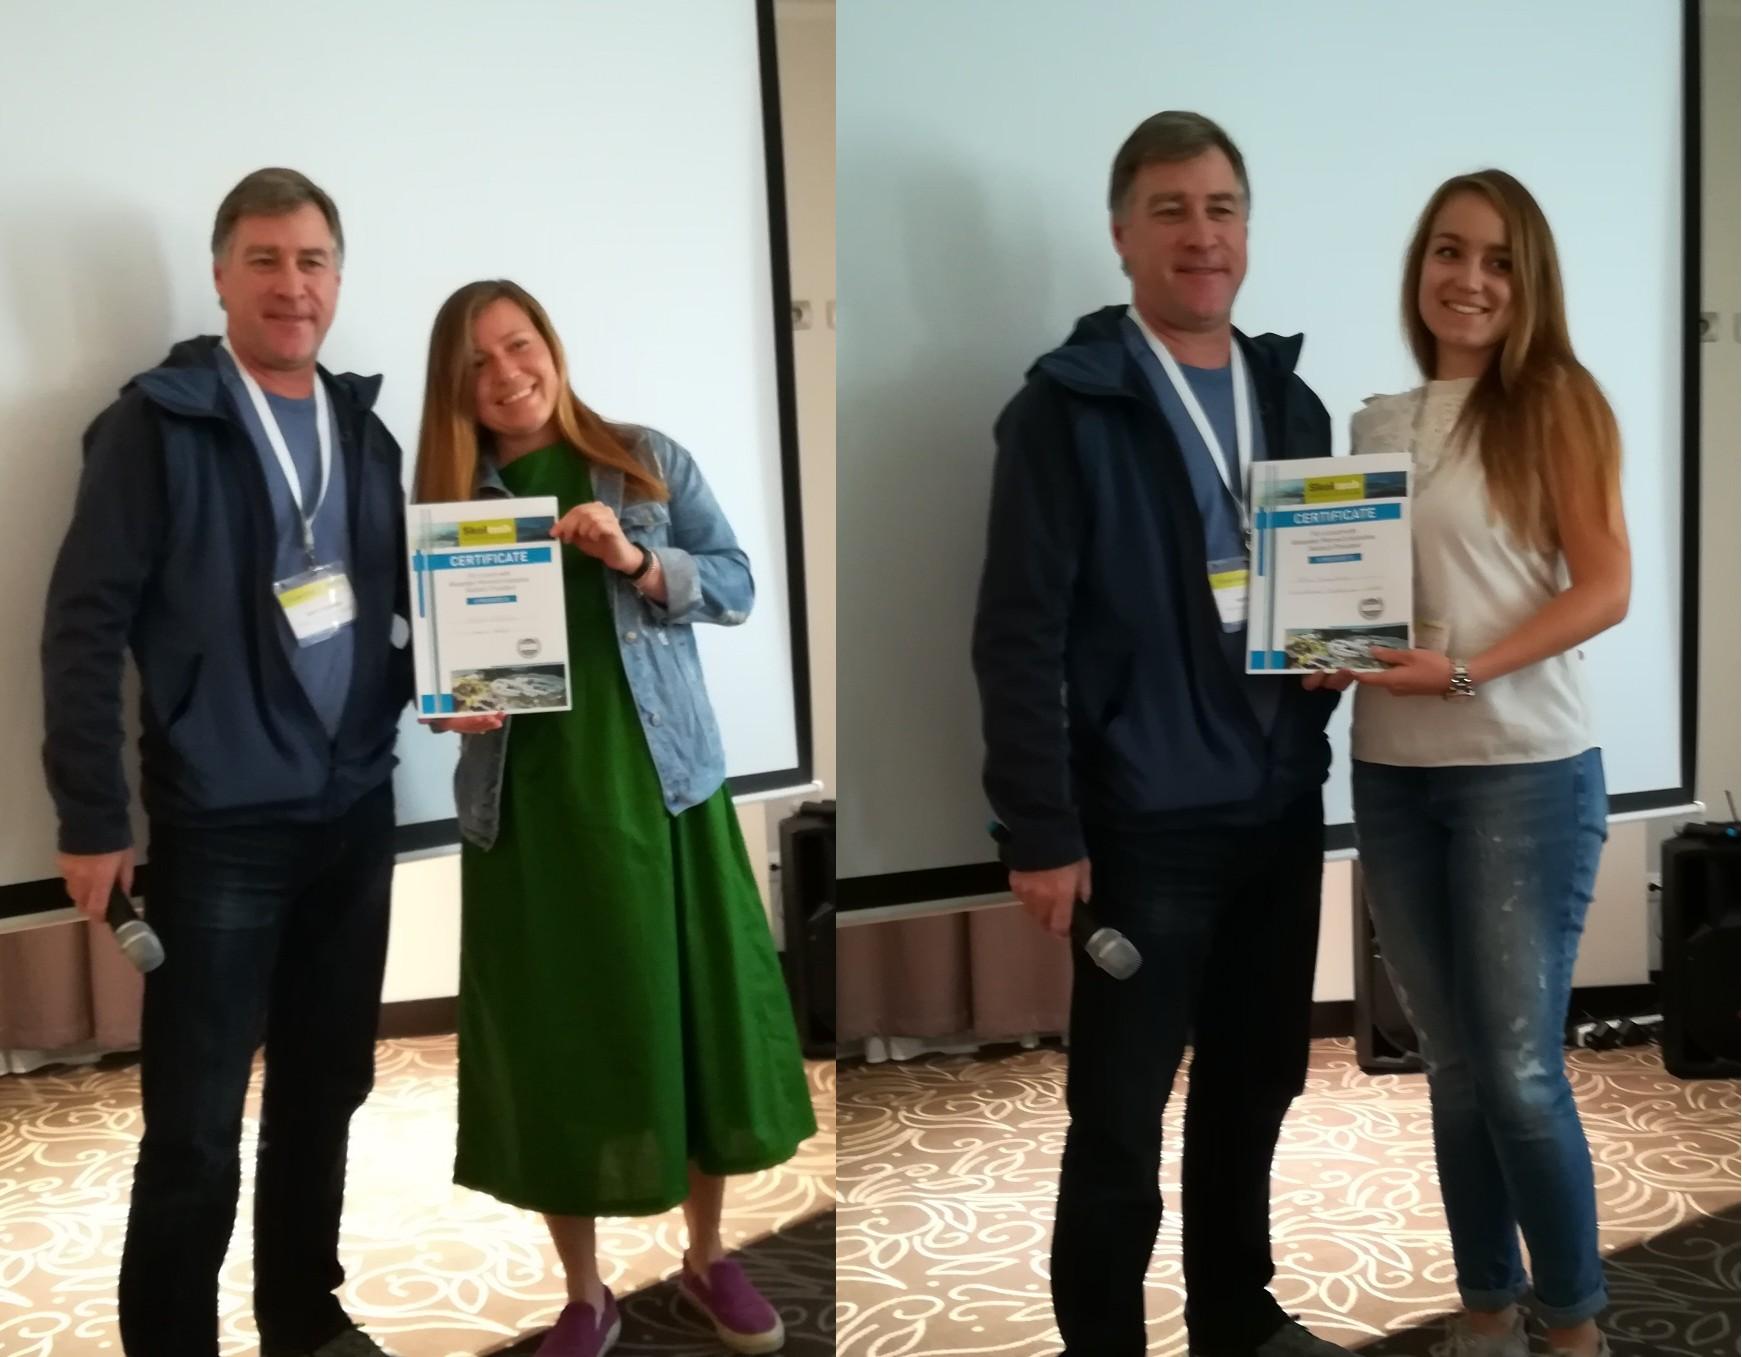 Poster session winners Yulia Naraykina and Natalia Glazkova pose with Professor Keith Stevenson. Photo: Skoltech.